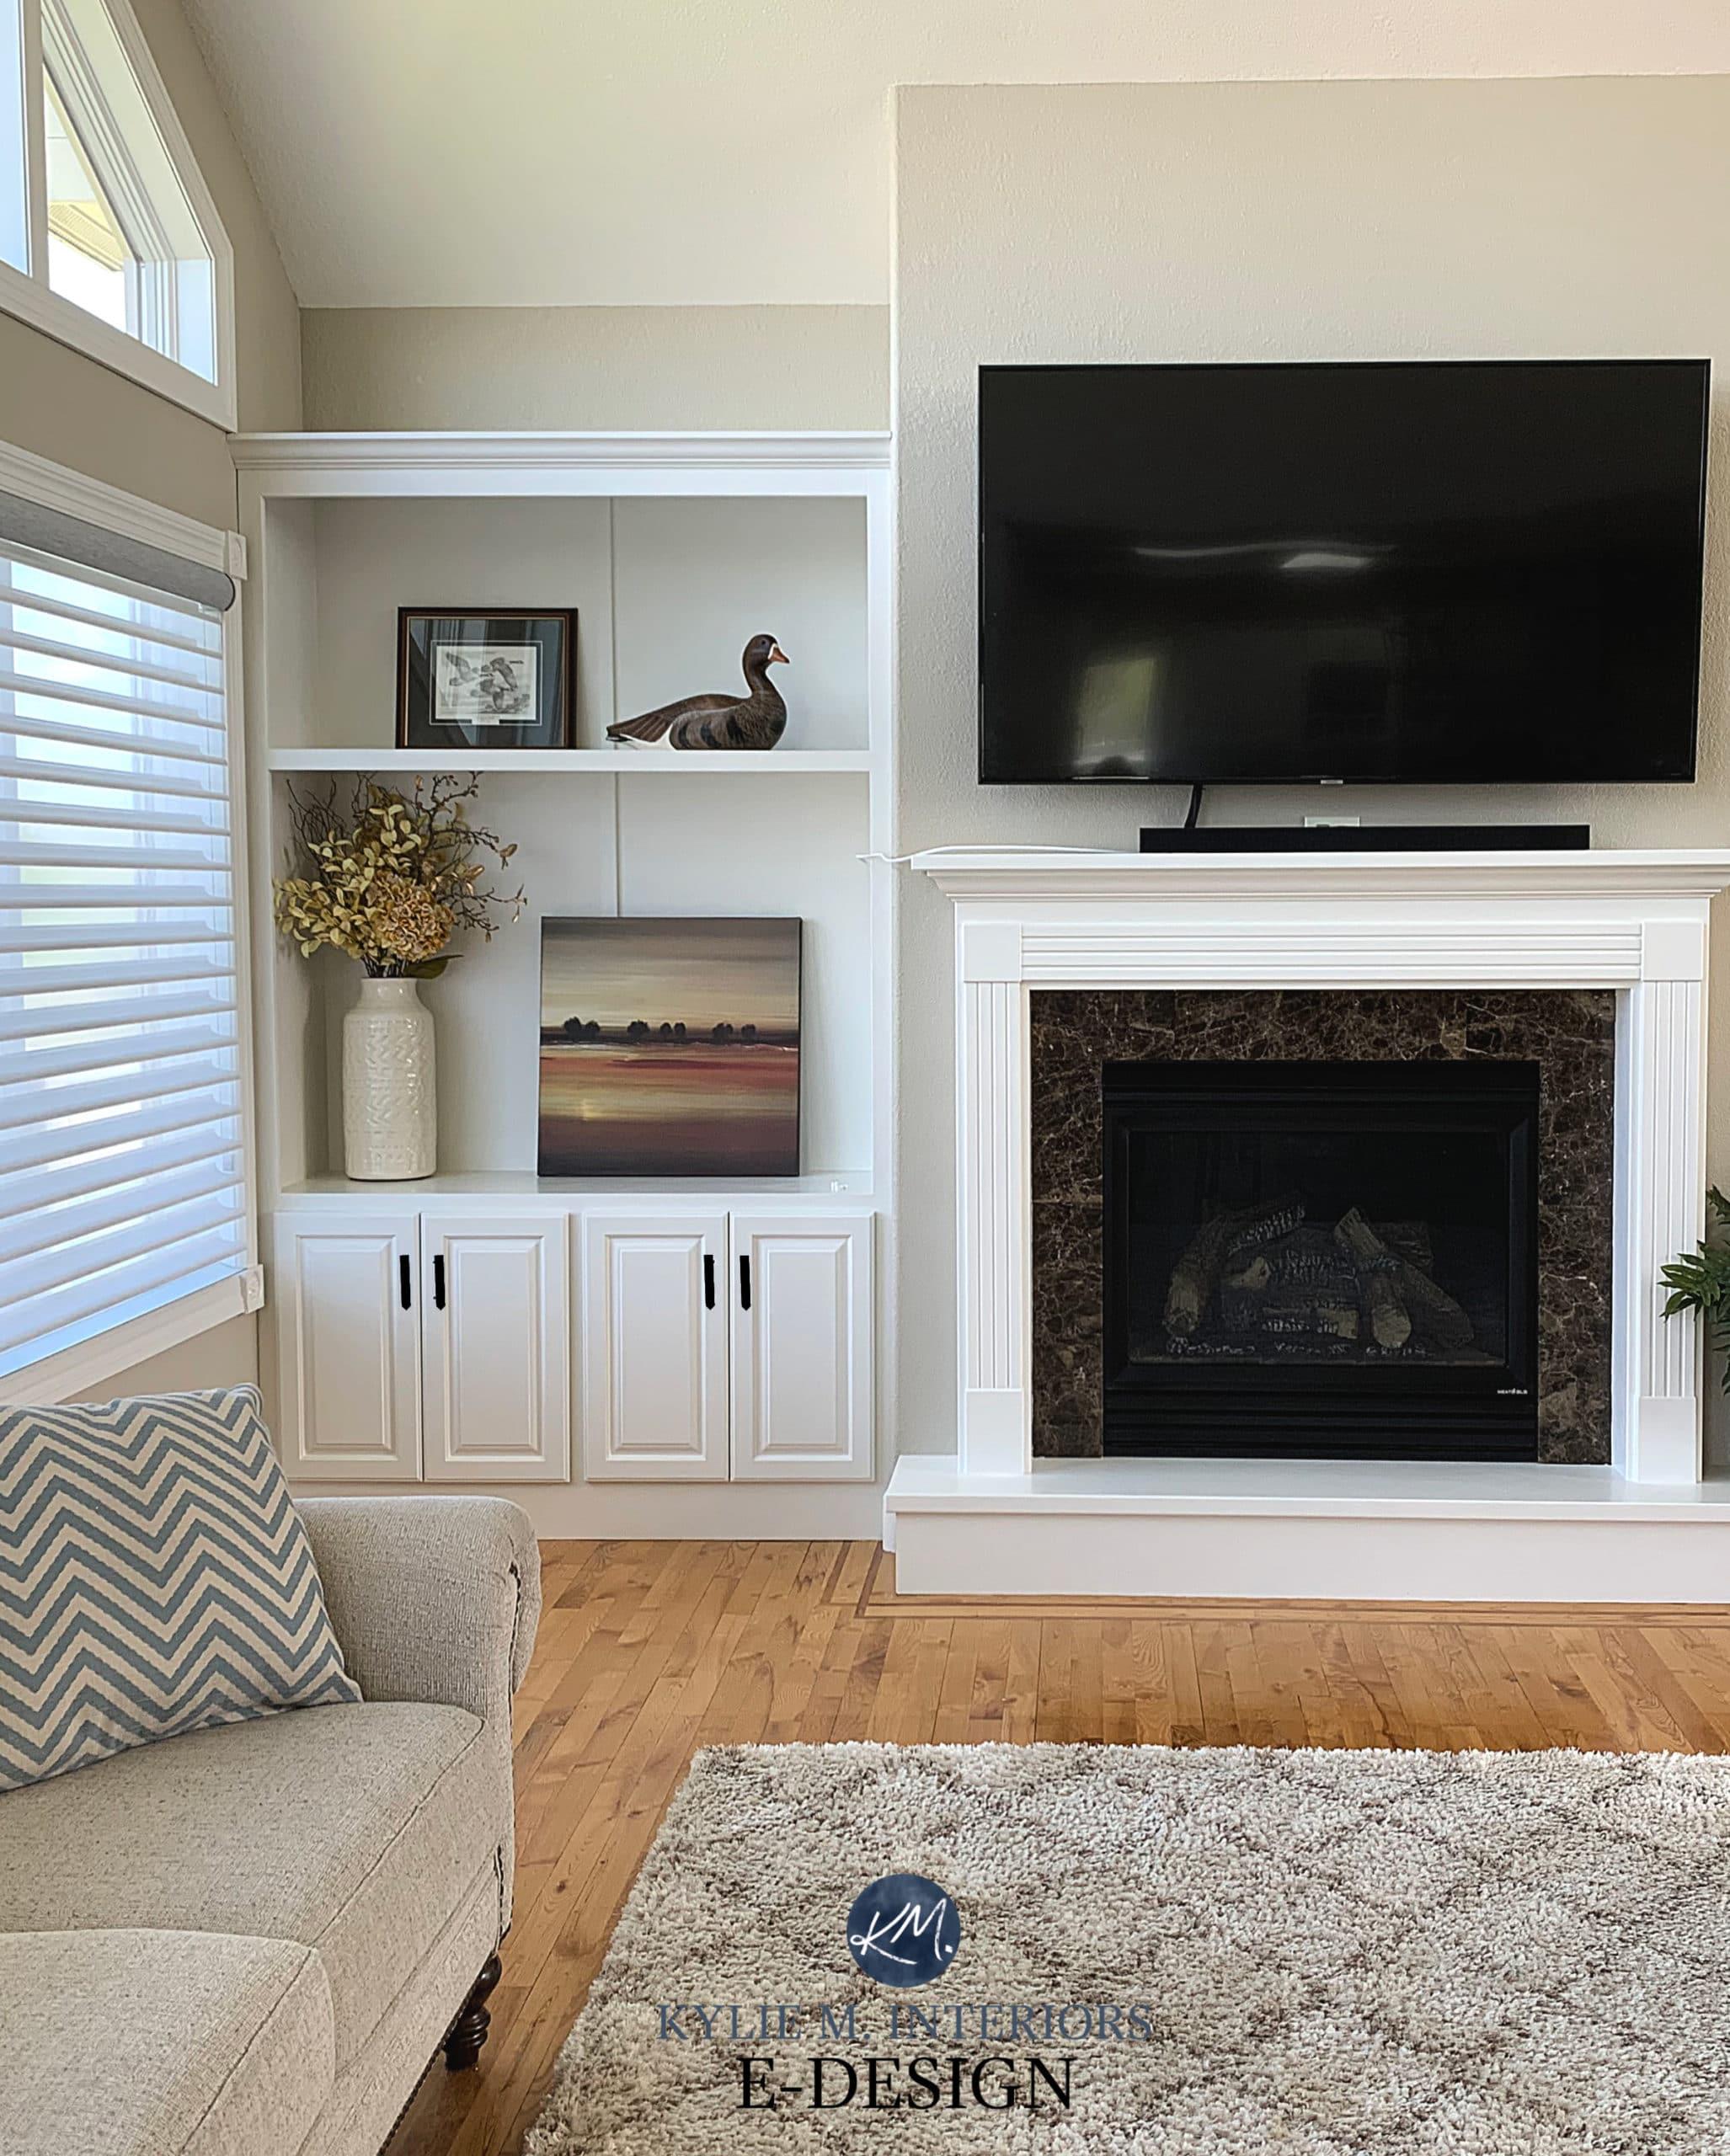 Best neutral beige, tan paint colour, Sherwin Sandbar. Living room, built-ins, fireplace, vaulted ceiling, Alabaster trim. Kylie M Interiors Edesign